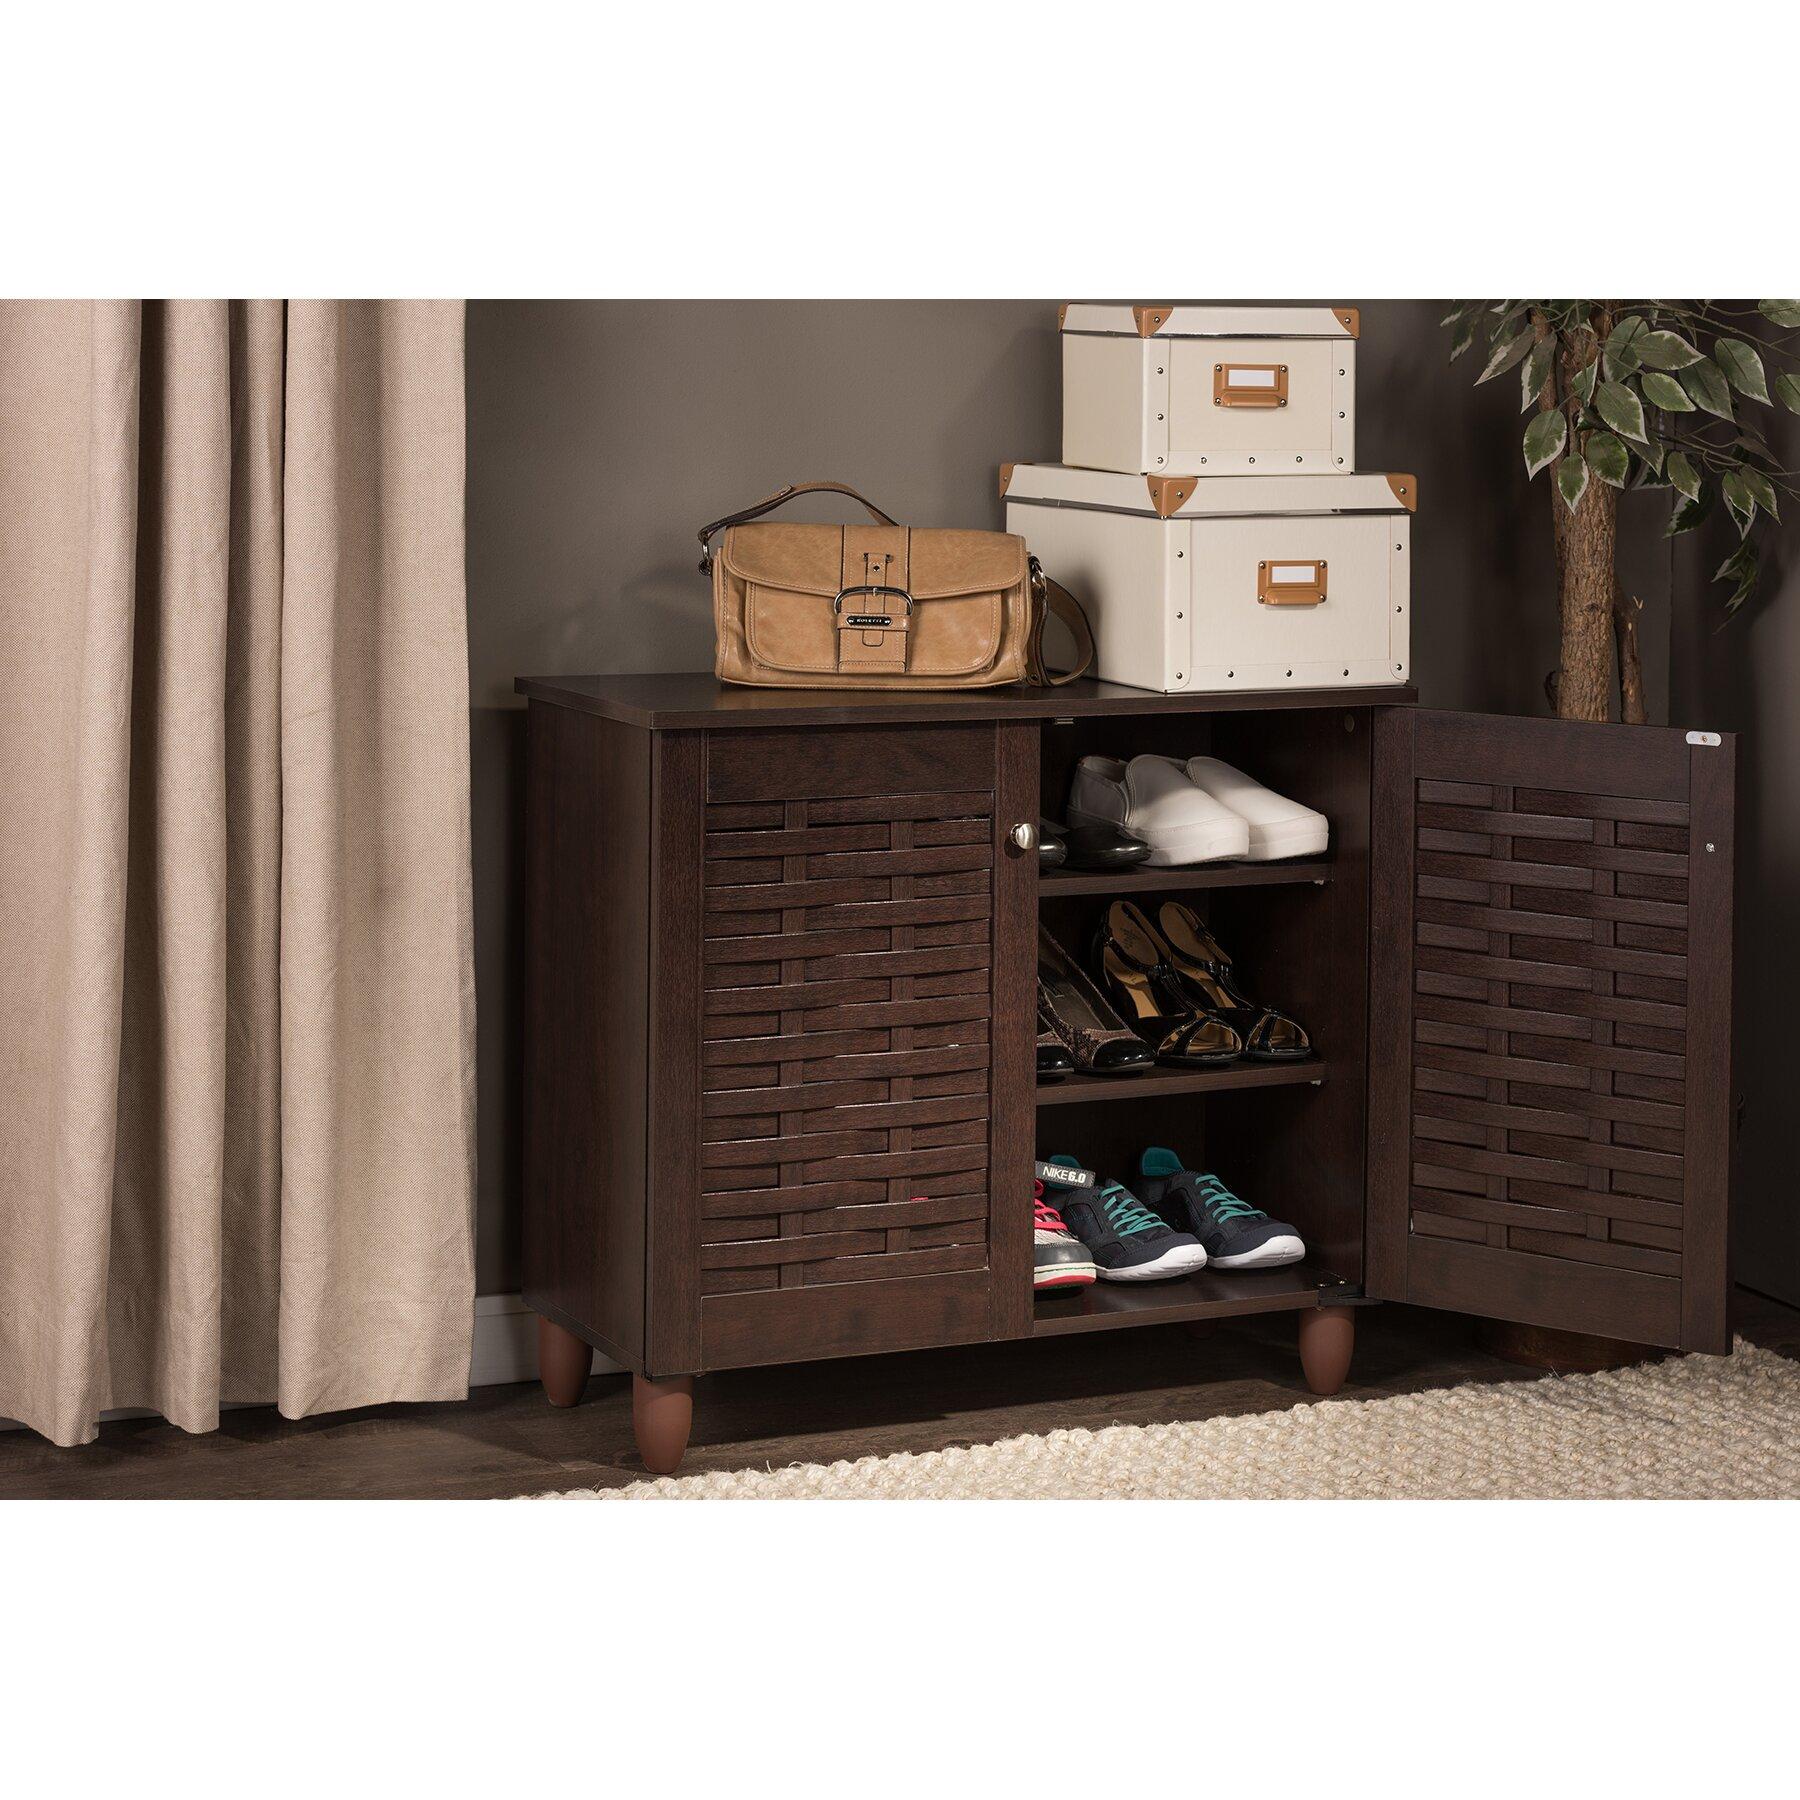 wholesale interiors baxton studio winda 9 pair shoe storage cabinet reviews wayfair. Black Bedroom Furniture Sets. Home Design Ideas